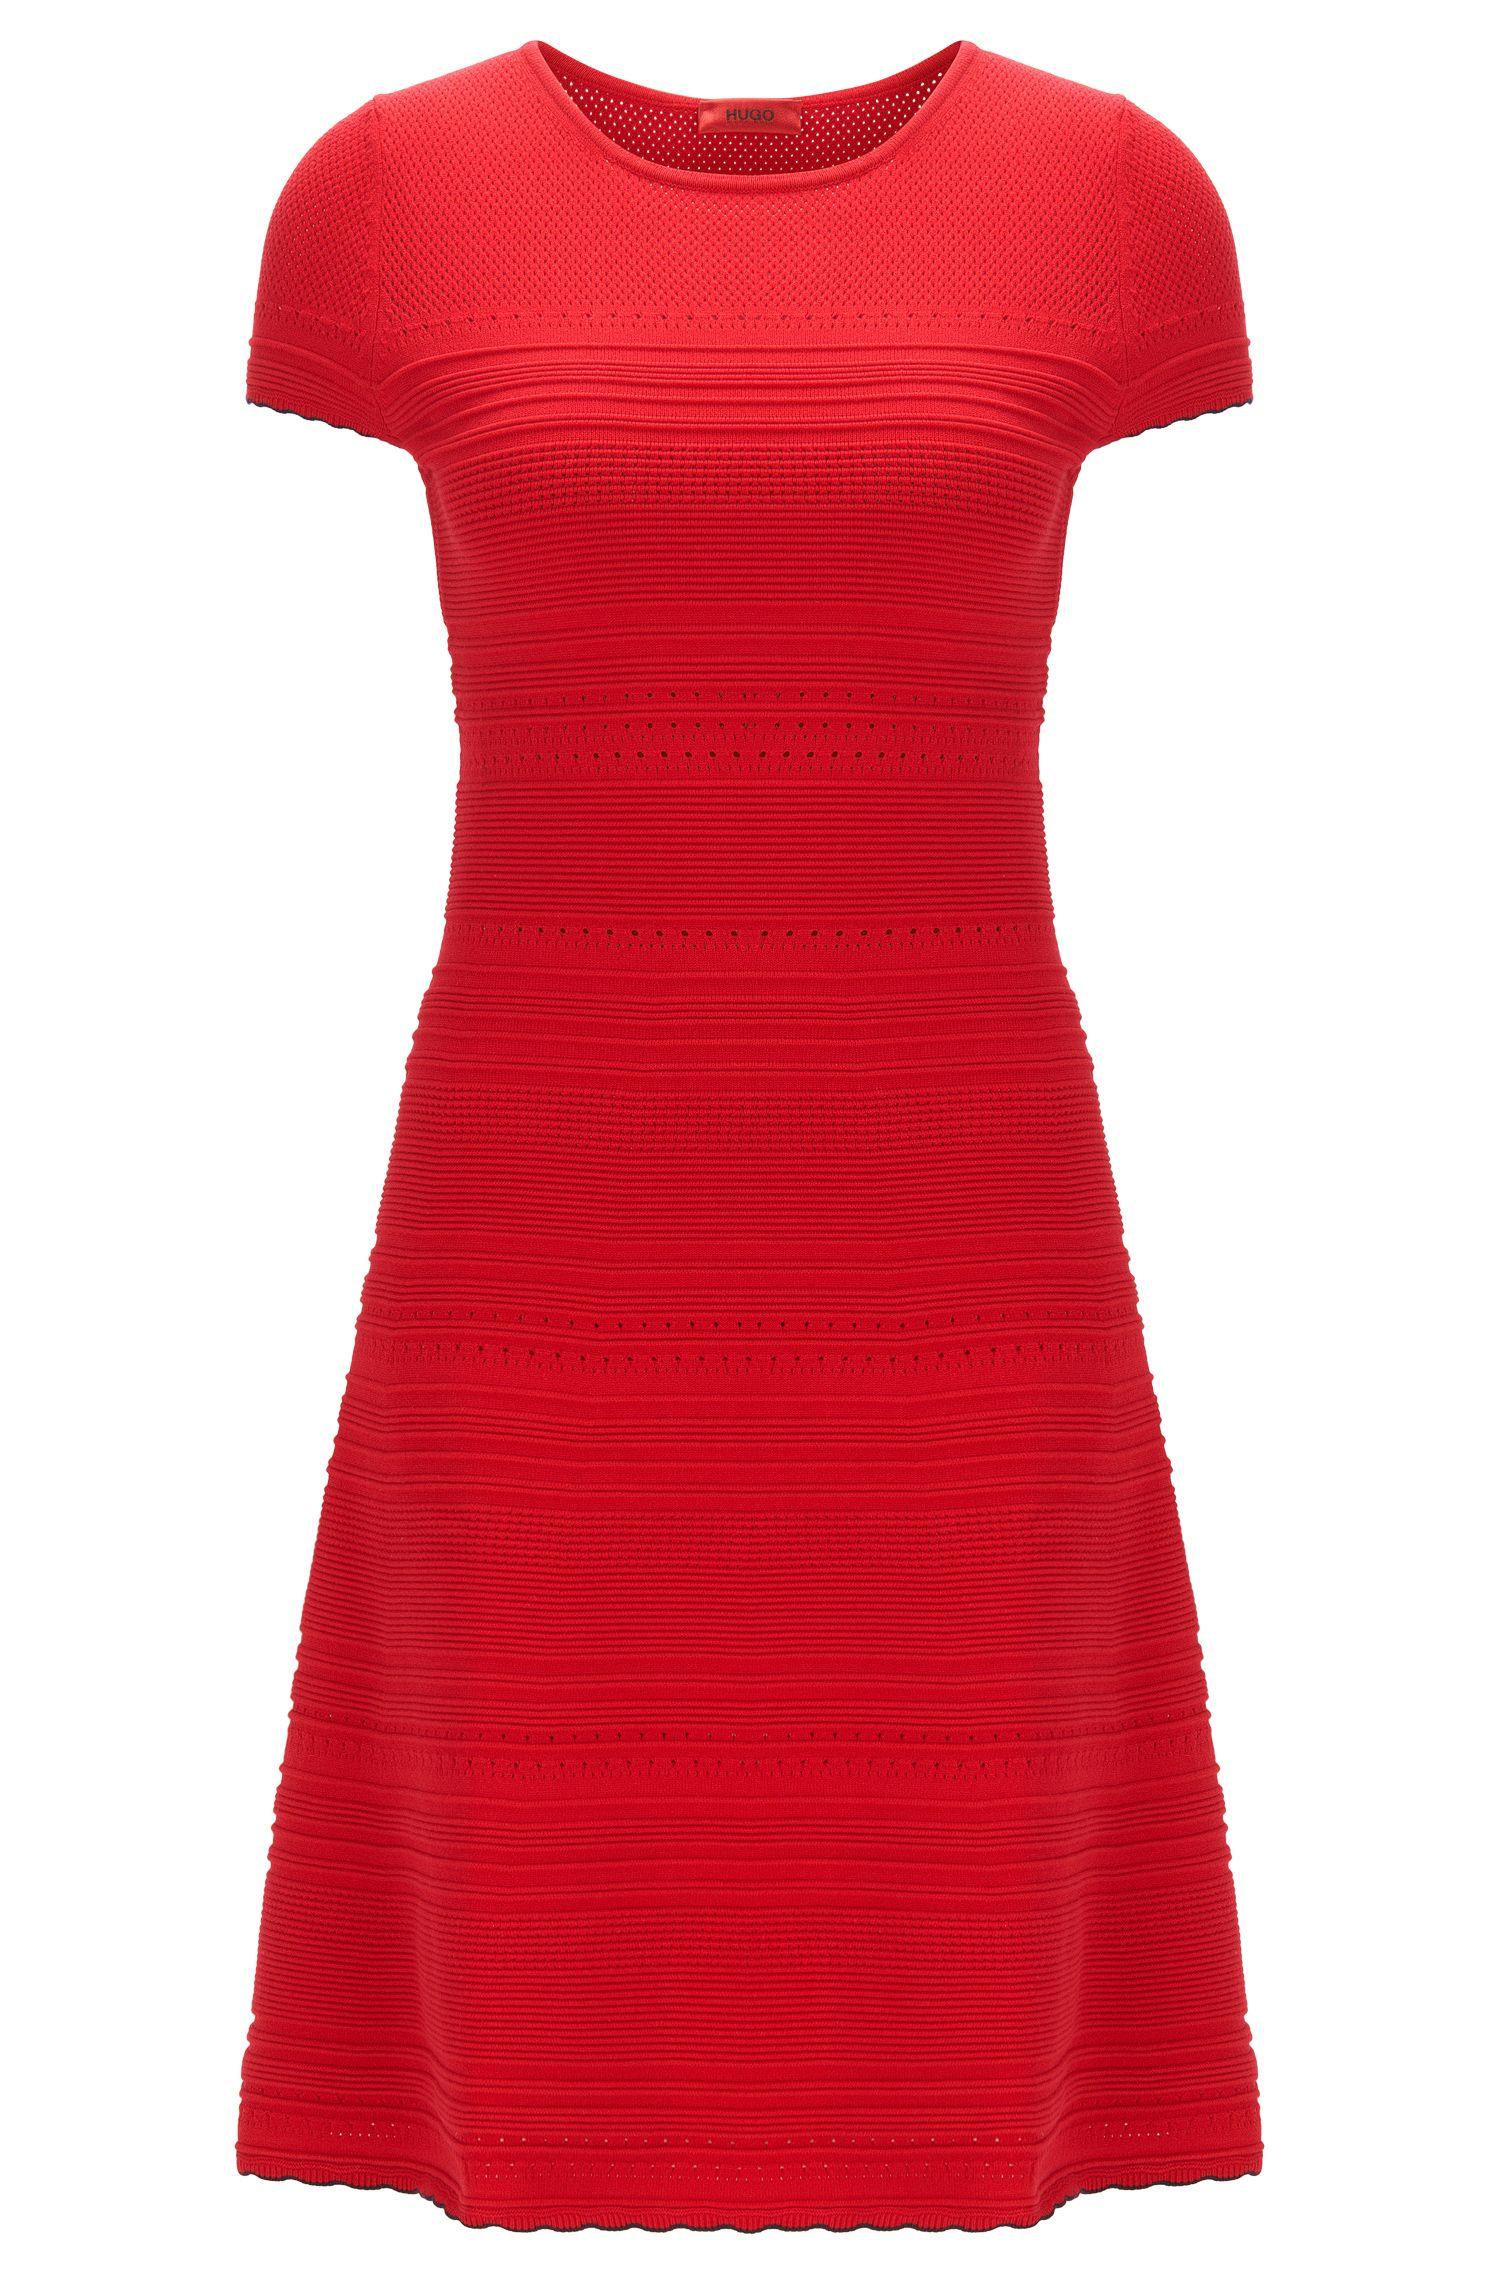 Slim-fit knit dress with scalloped hem